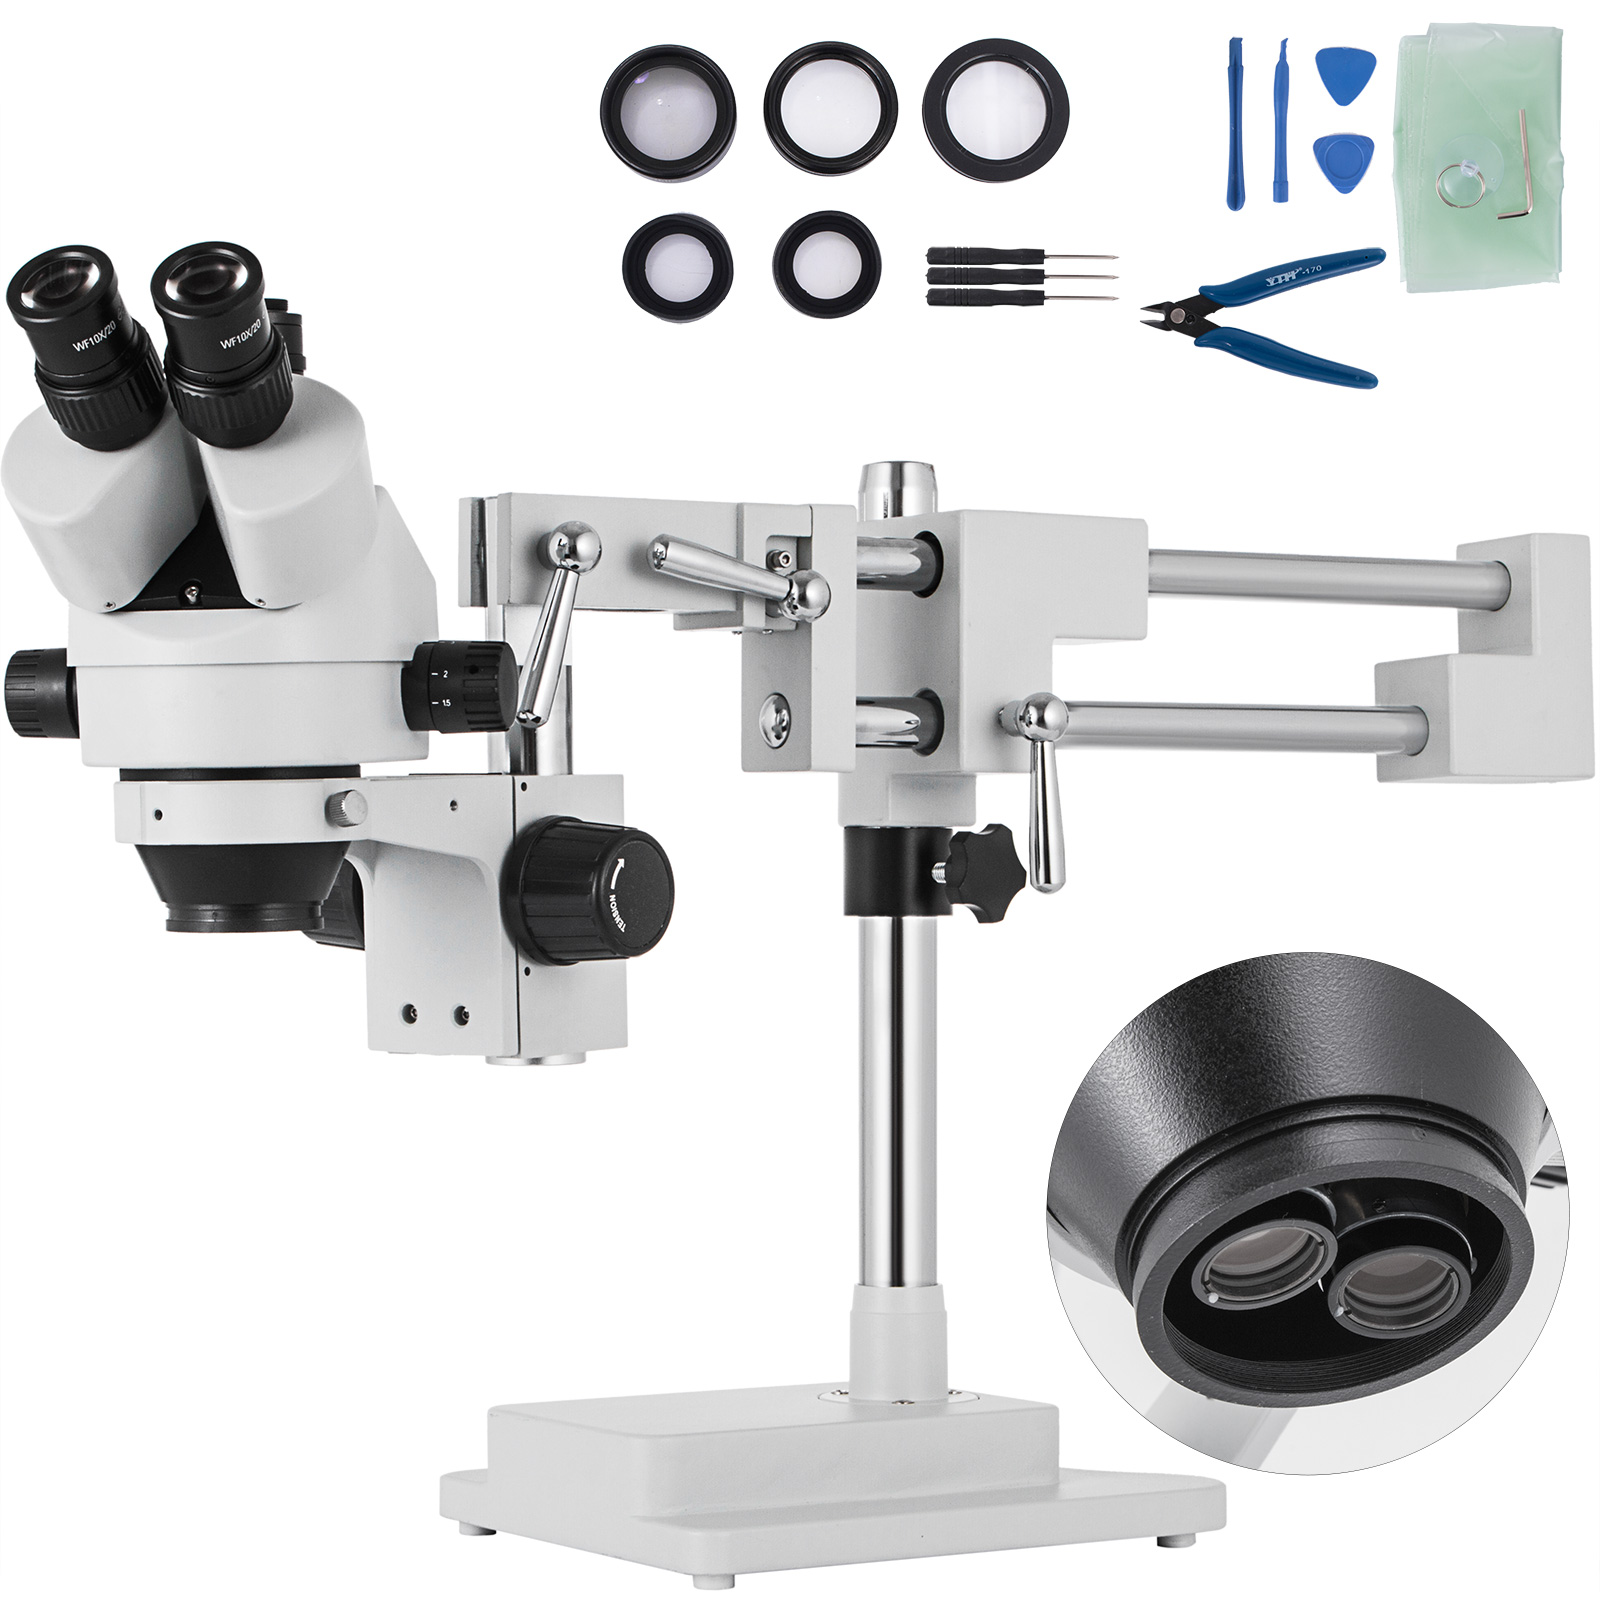 AmScope 3.5X-45X Simul-Focal Stereo Zoom Microscope with 30W LED Illuminator and 16MP USB3 Camera